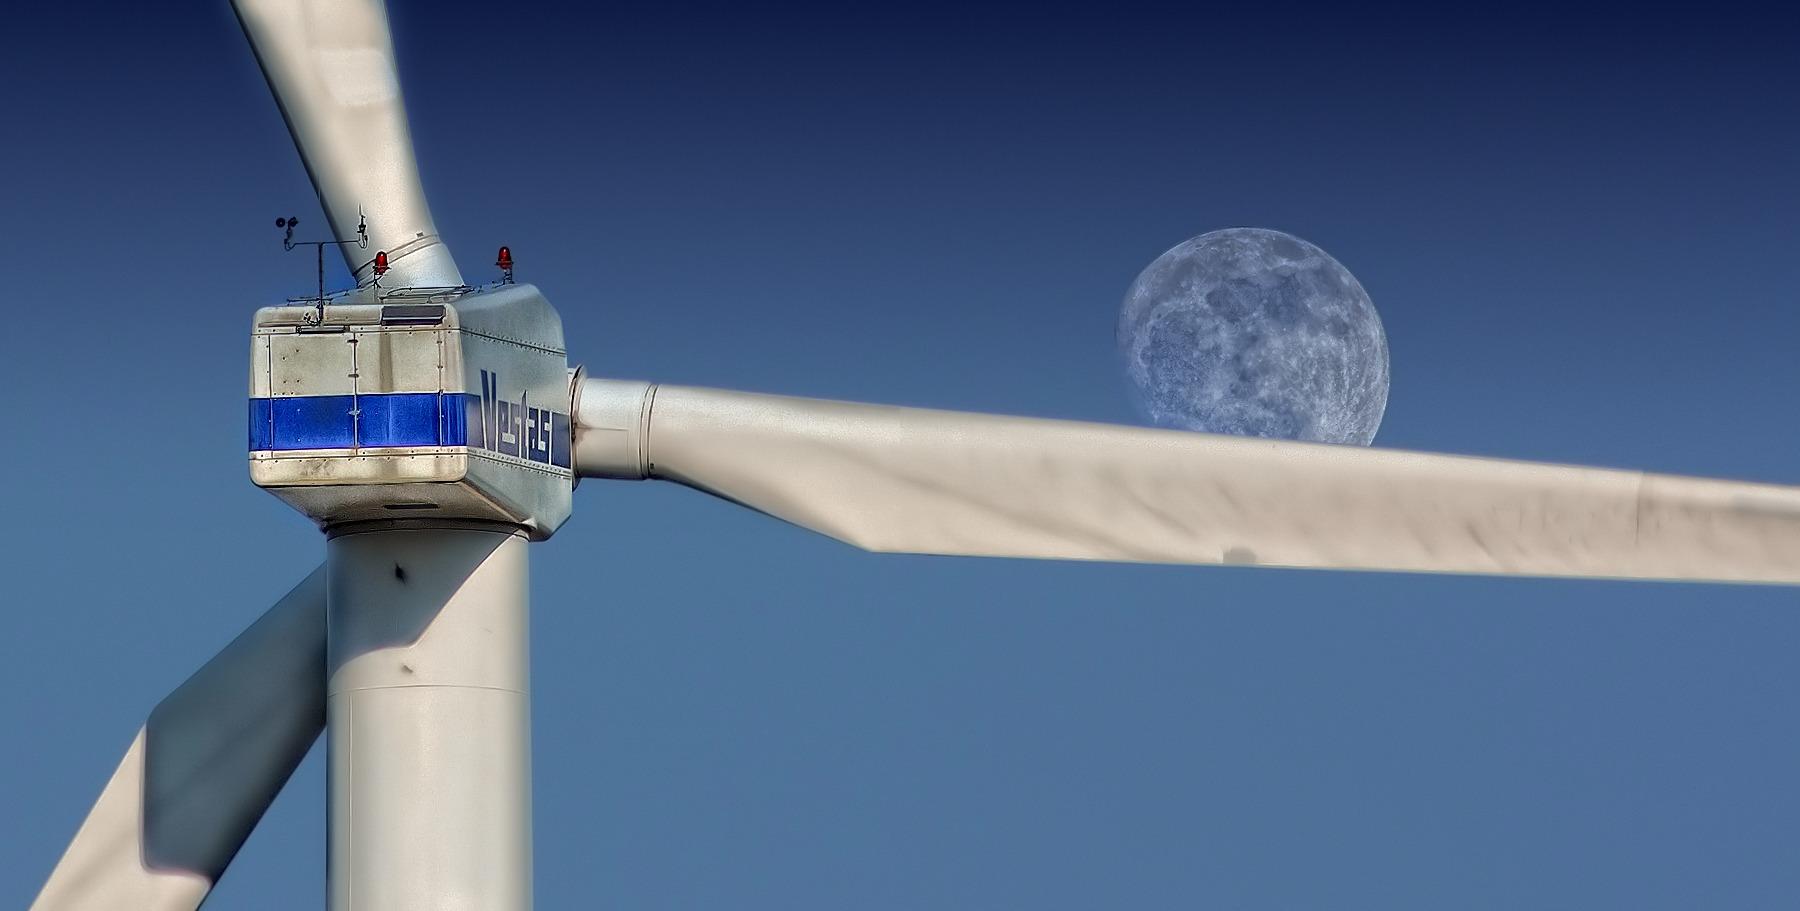 pinwheel-wind-power-enerie-environmental-technology (1)